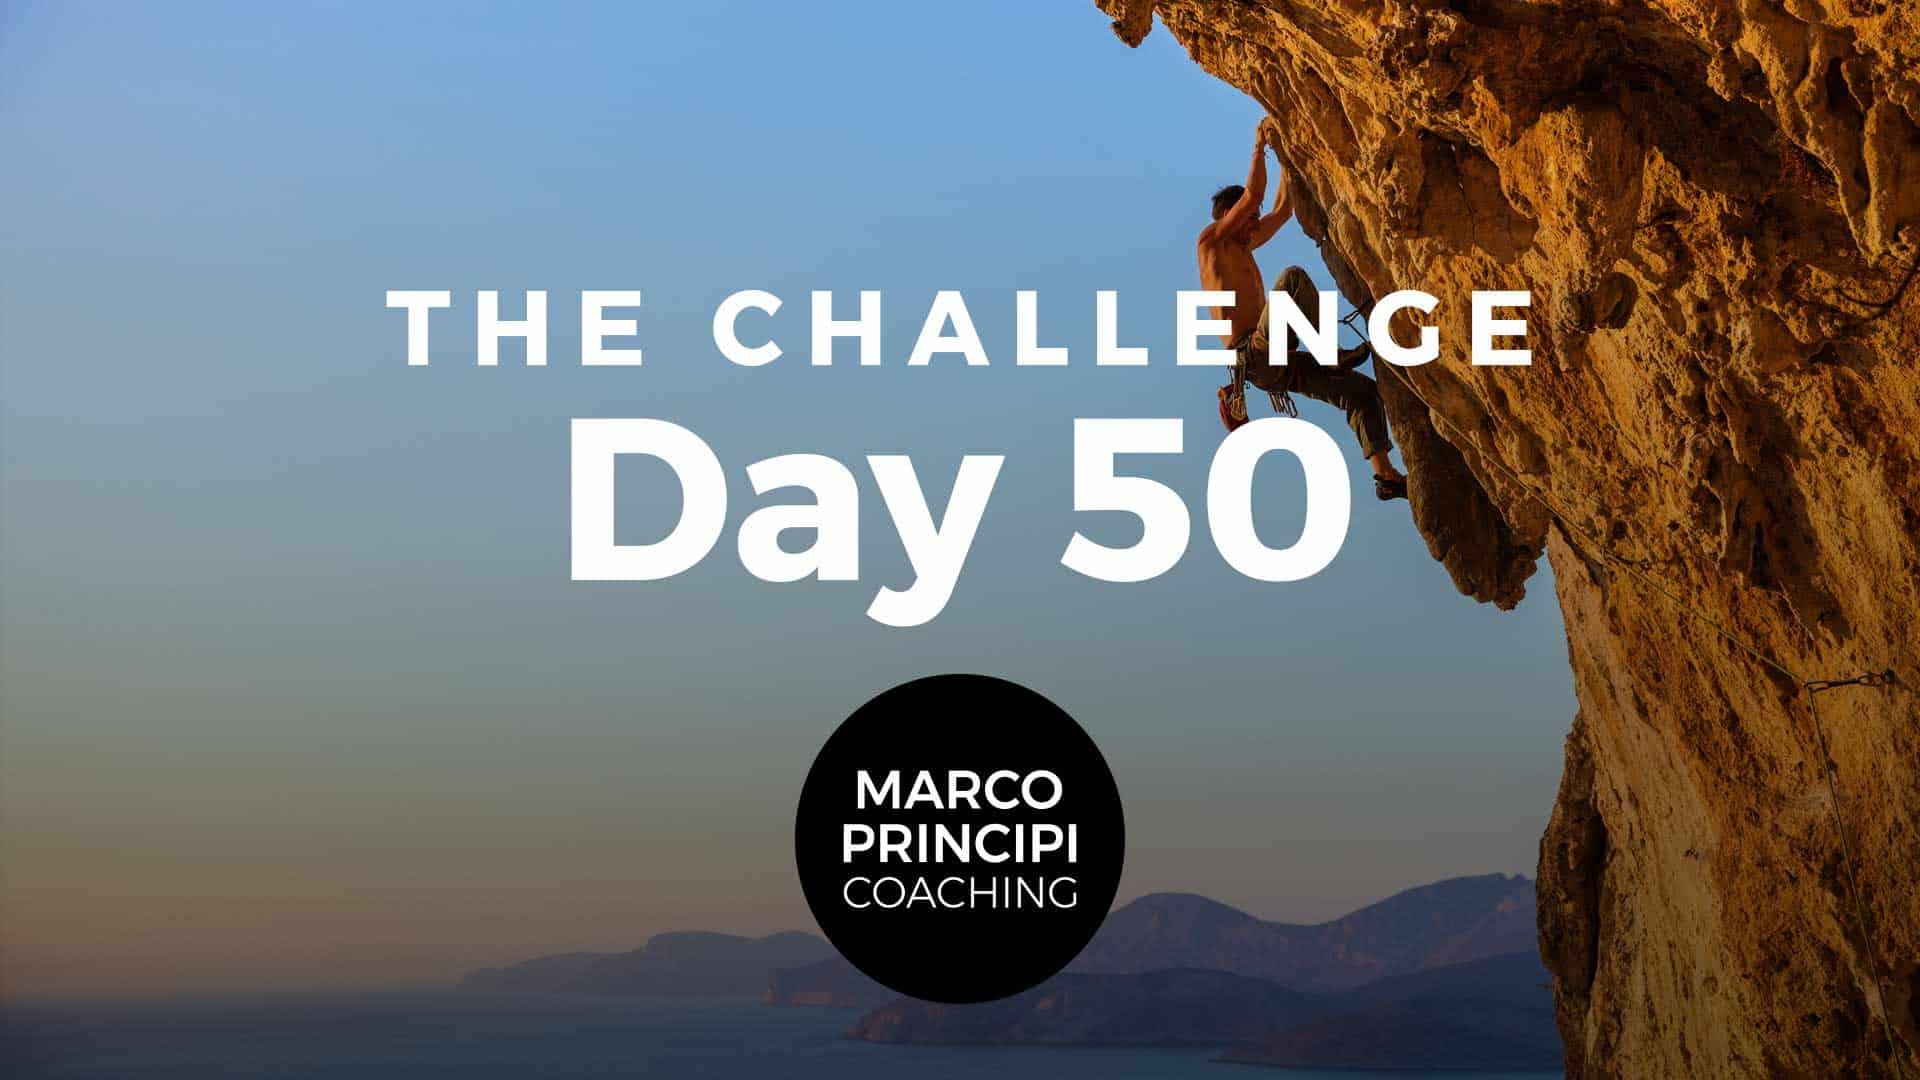 Marco Principi The Challenge Day 50